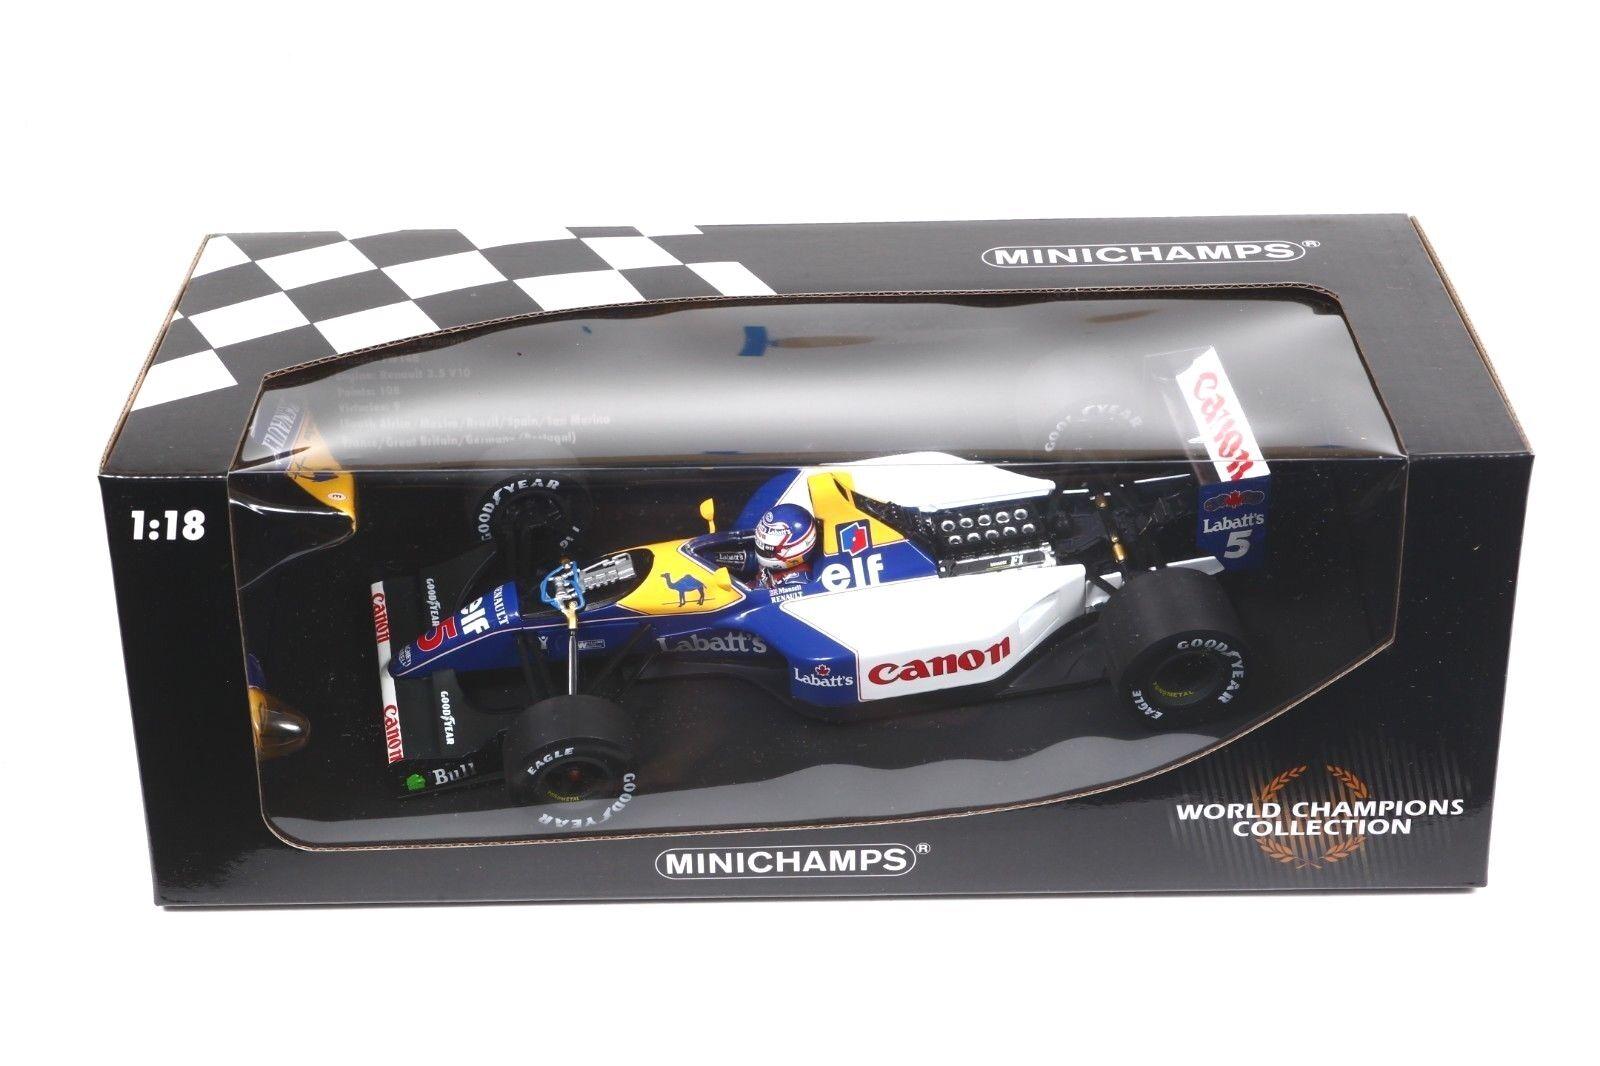 Minichamps F1 1 18 1992 Nigel Mansell Williams FW14 serie campeón del mundo